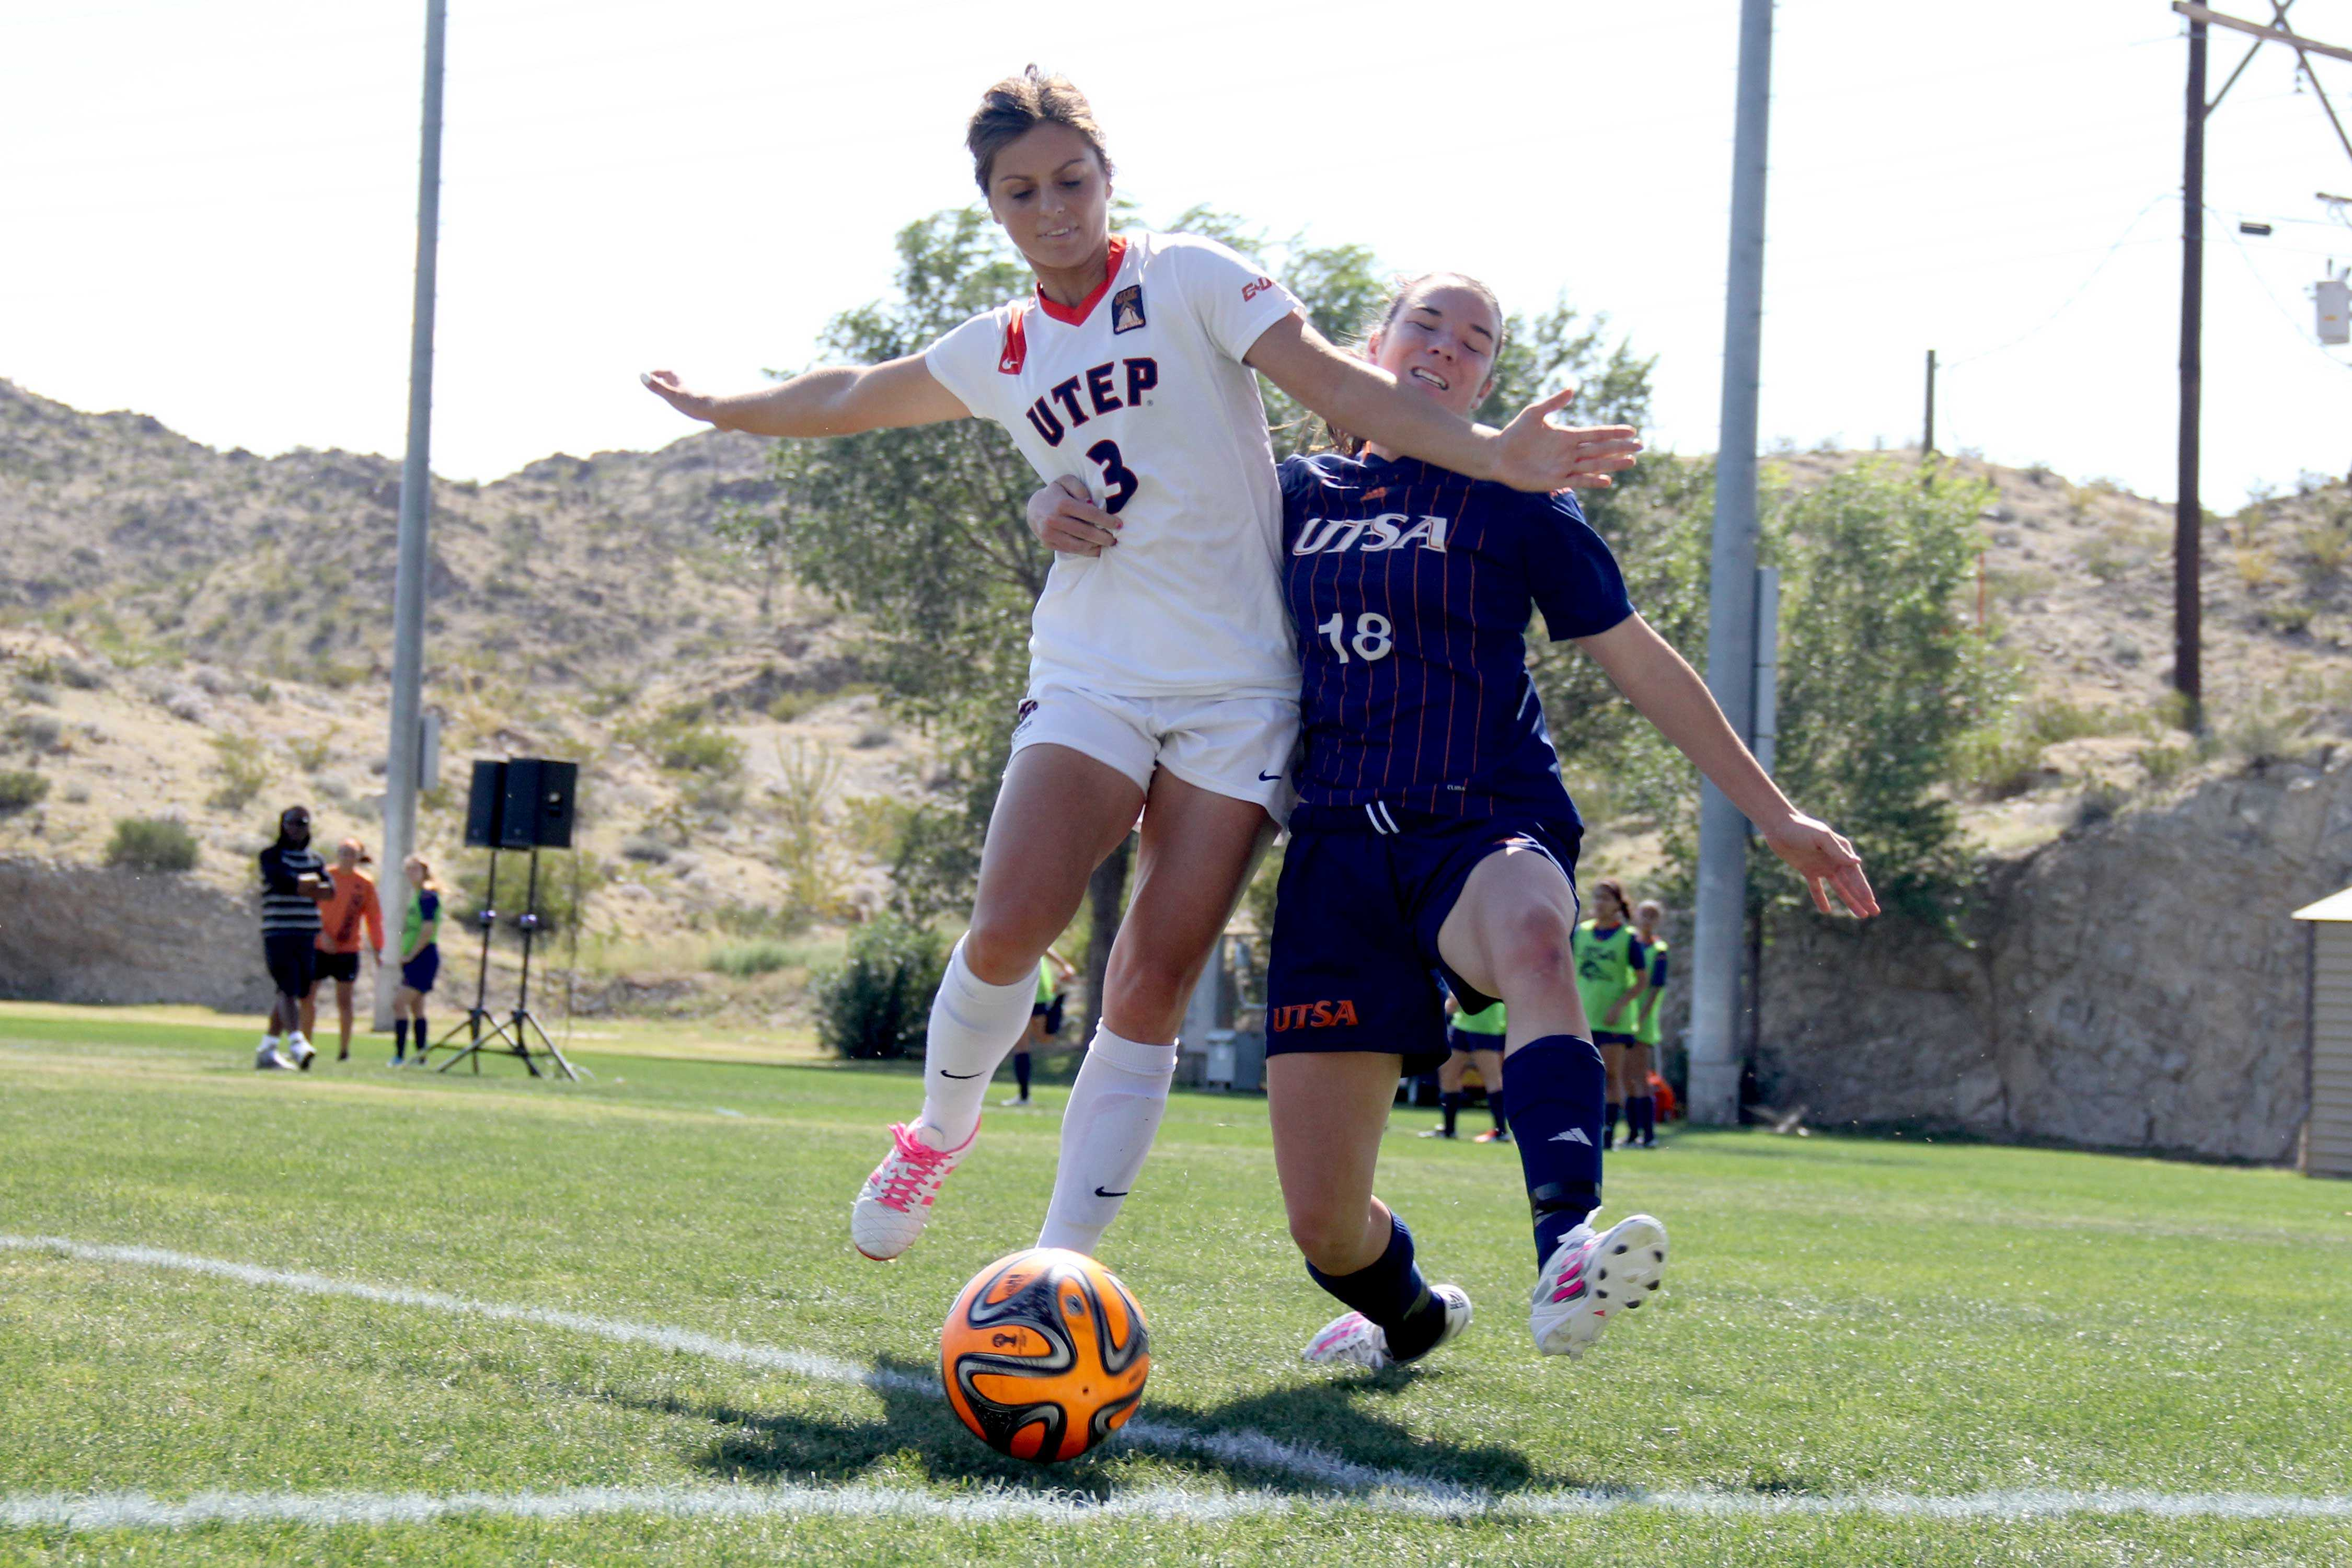 Senior center back Hannah Asuchak attempts to steal the ball from a UTSA midfielder.